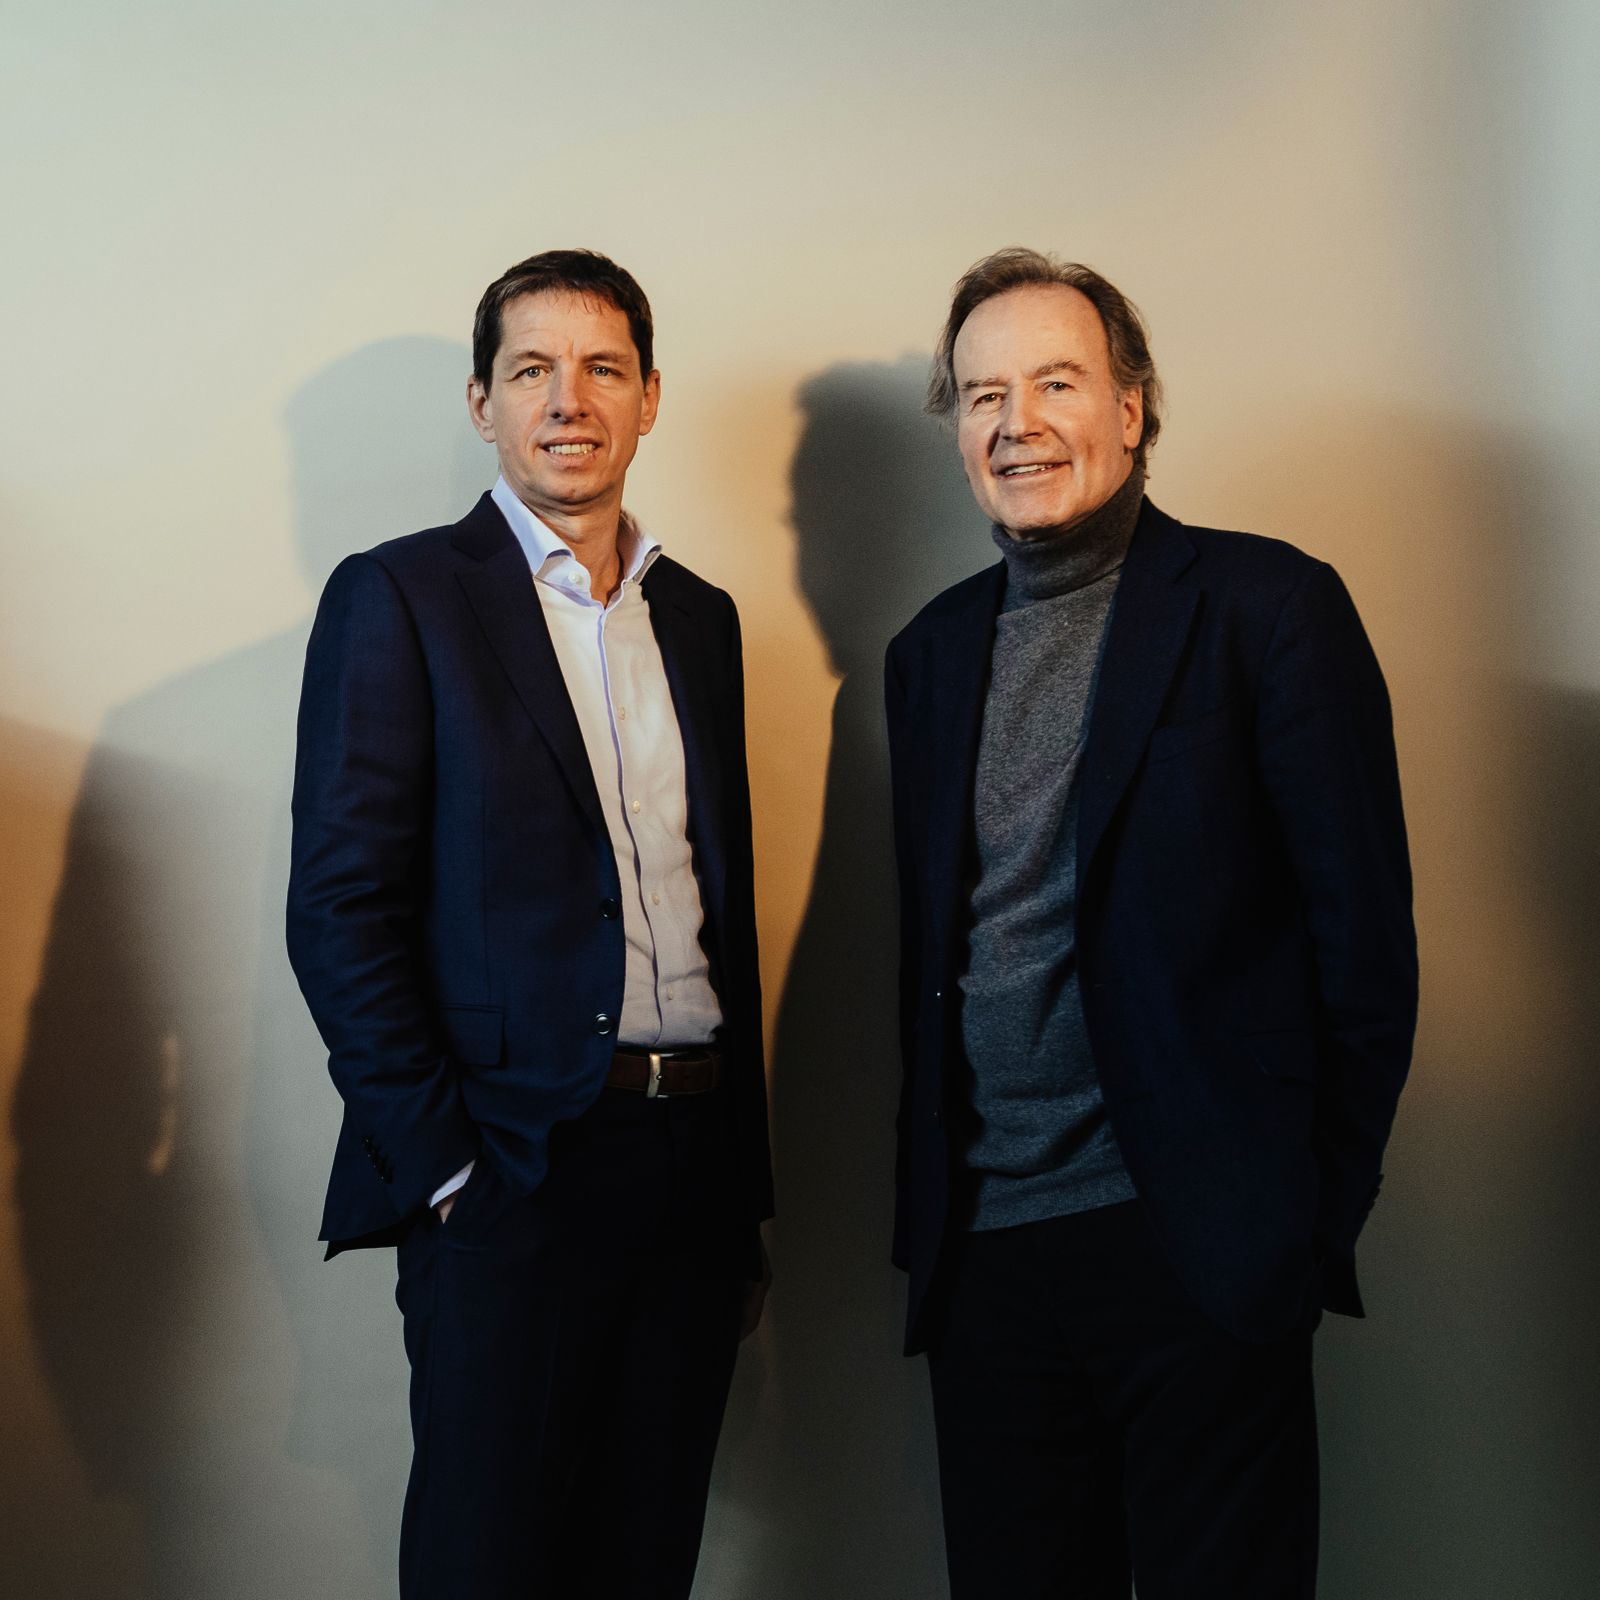 Helmut Jeggle und Michael Motschmann